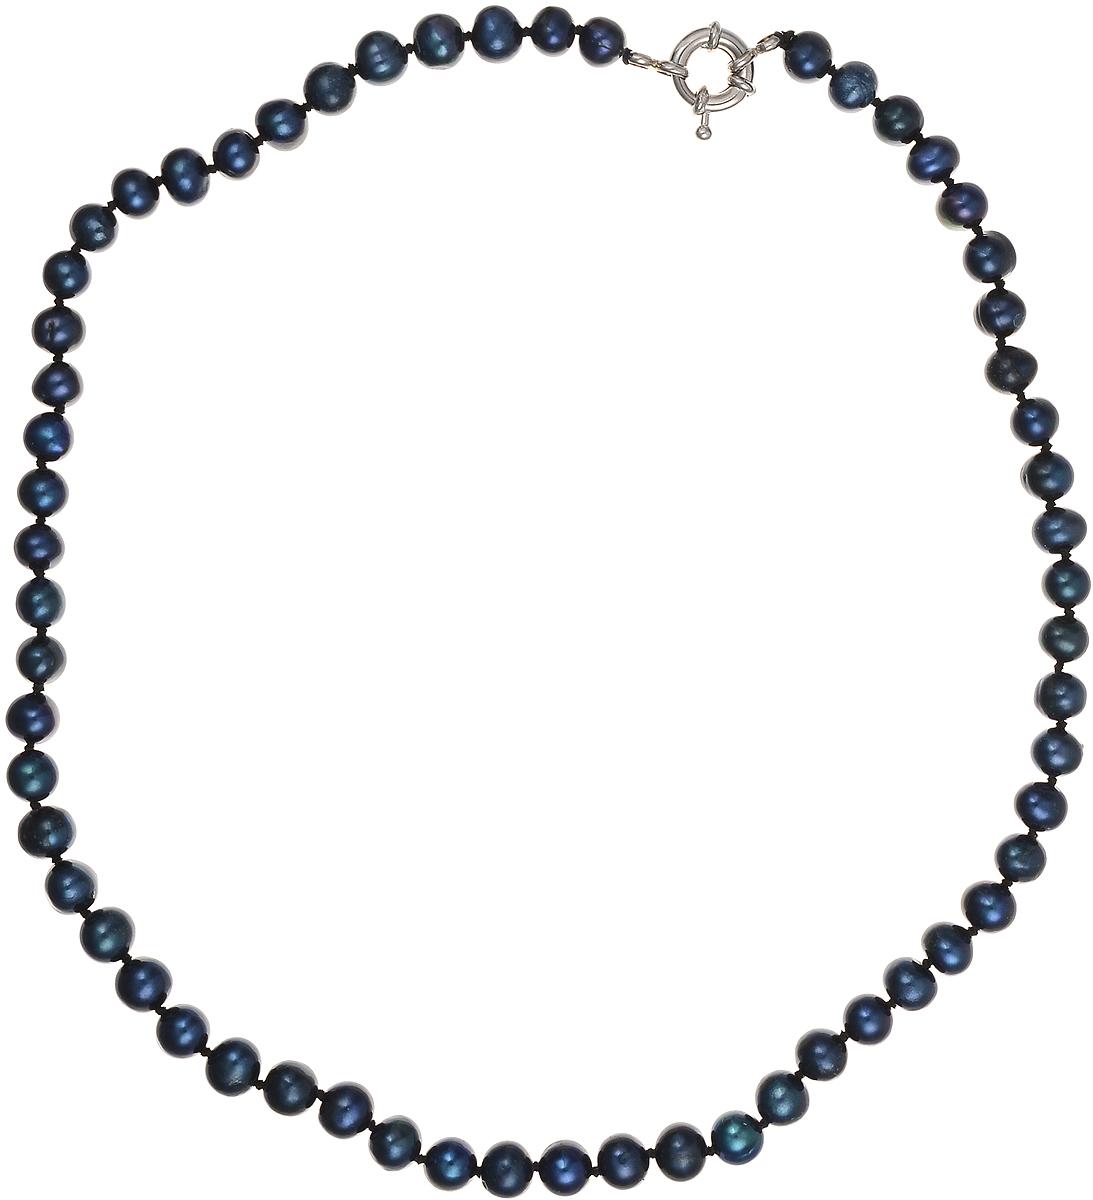 Бусы Art-Silver, цвет: синий, длина 45 см. КЖ7-8А+45-537